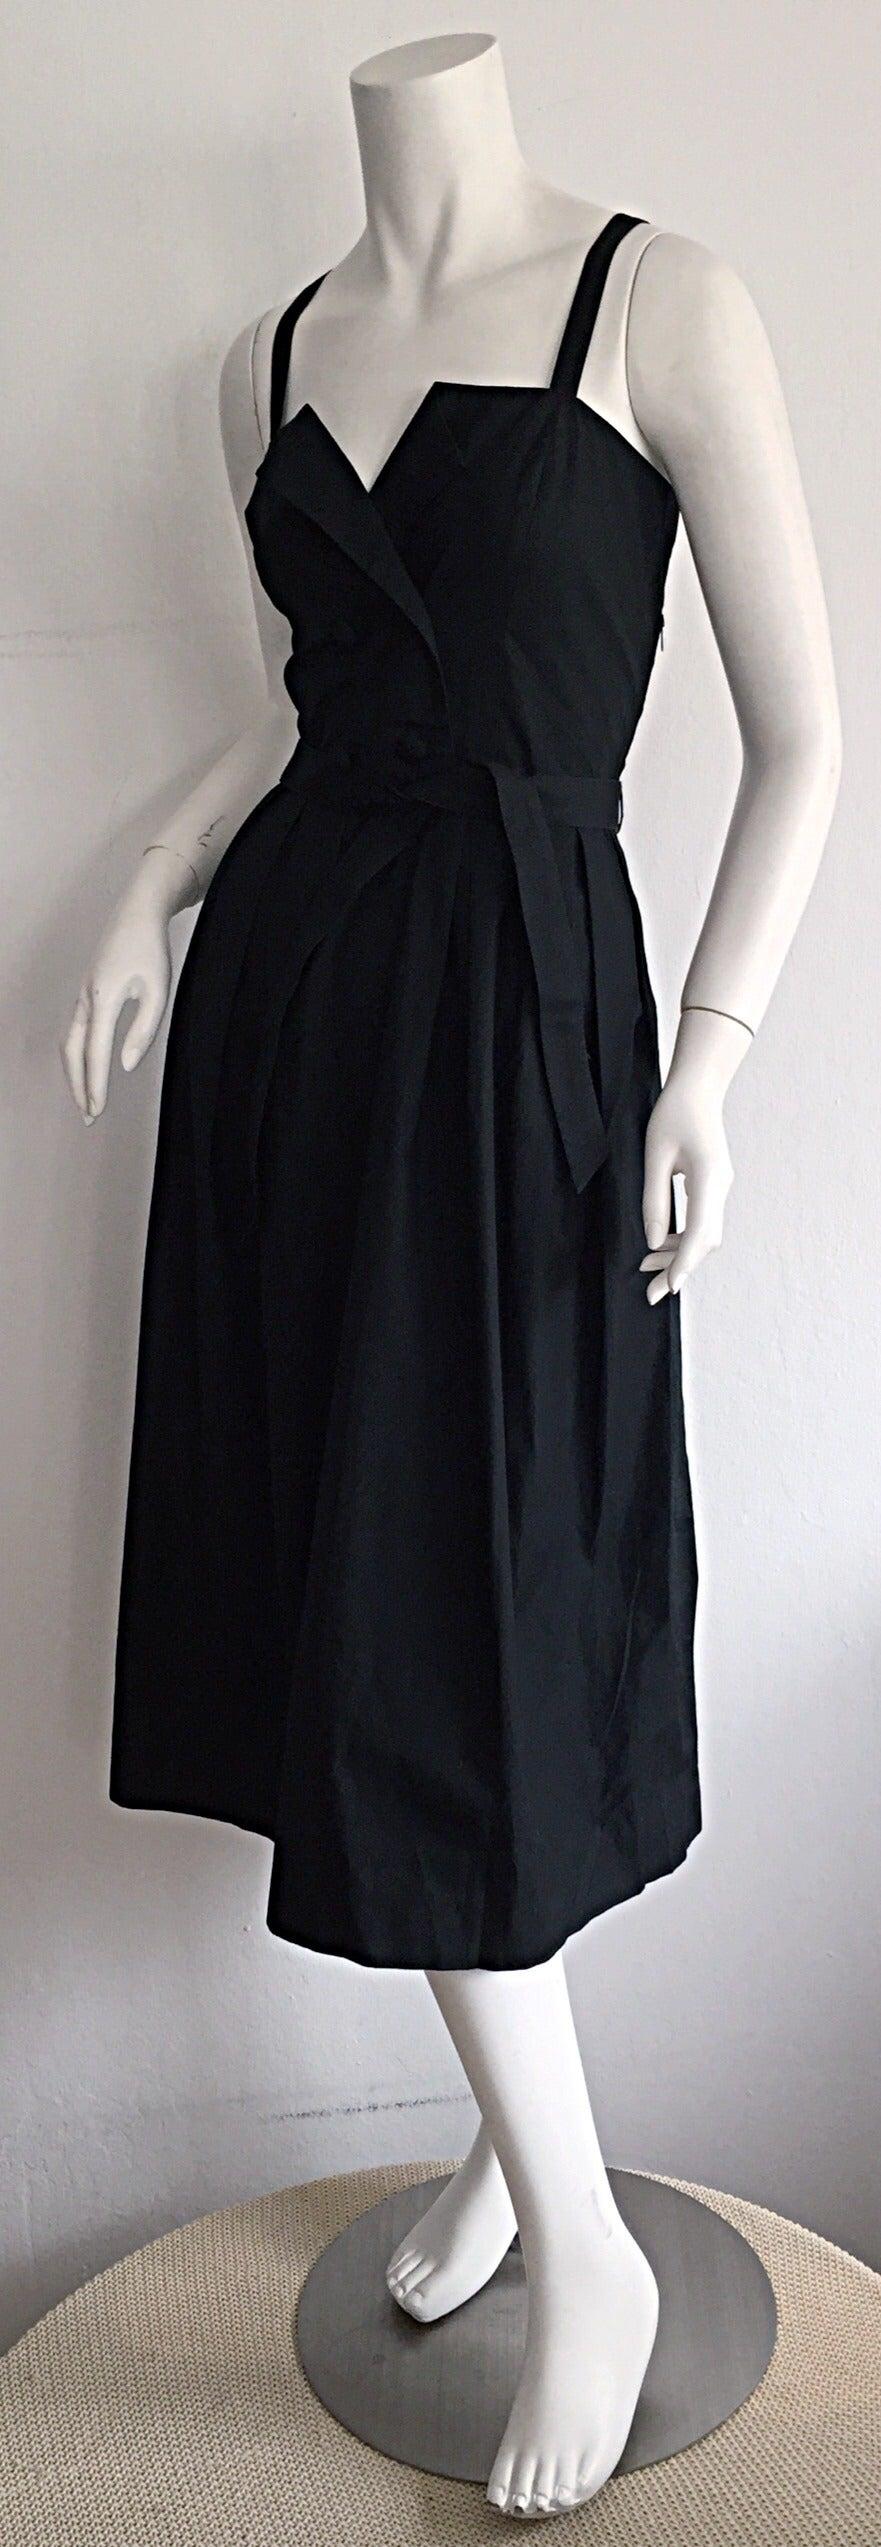 Beautiful Vintage Emmanuelle Khanh Black Cotton Tuxedo Sundress French Dress 5